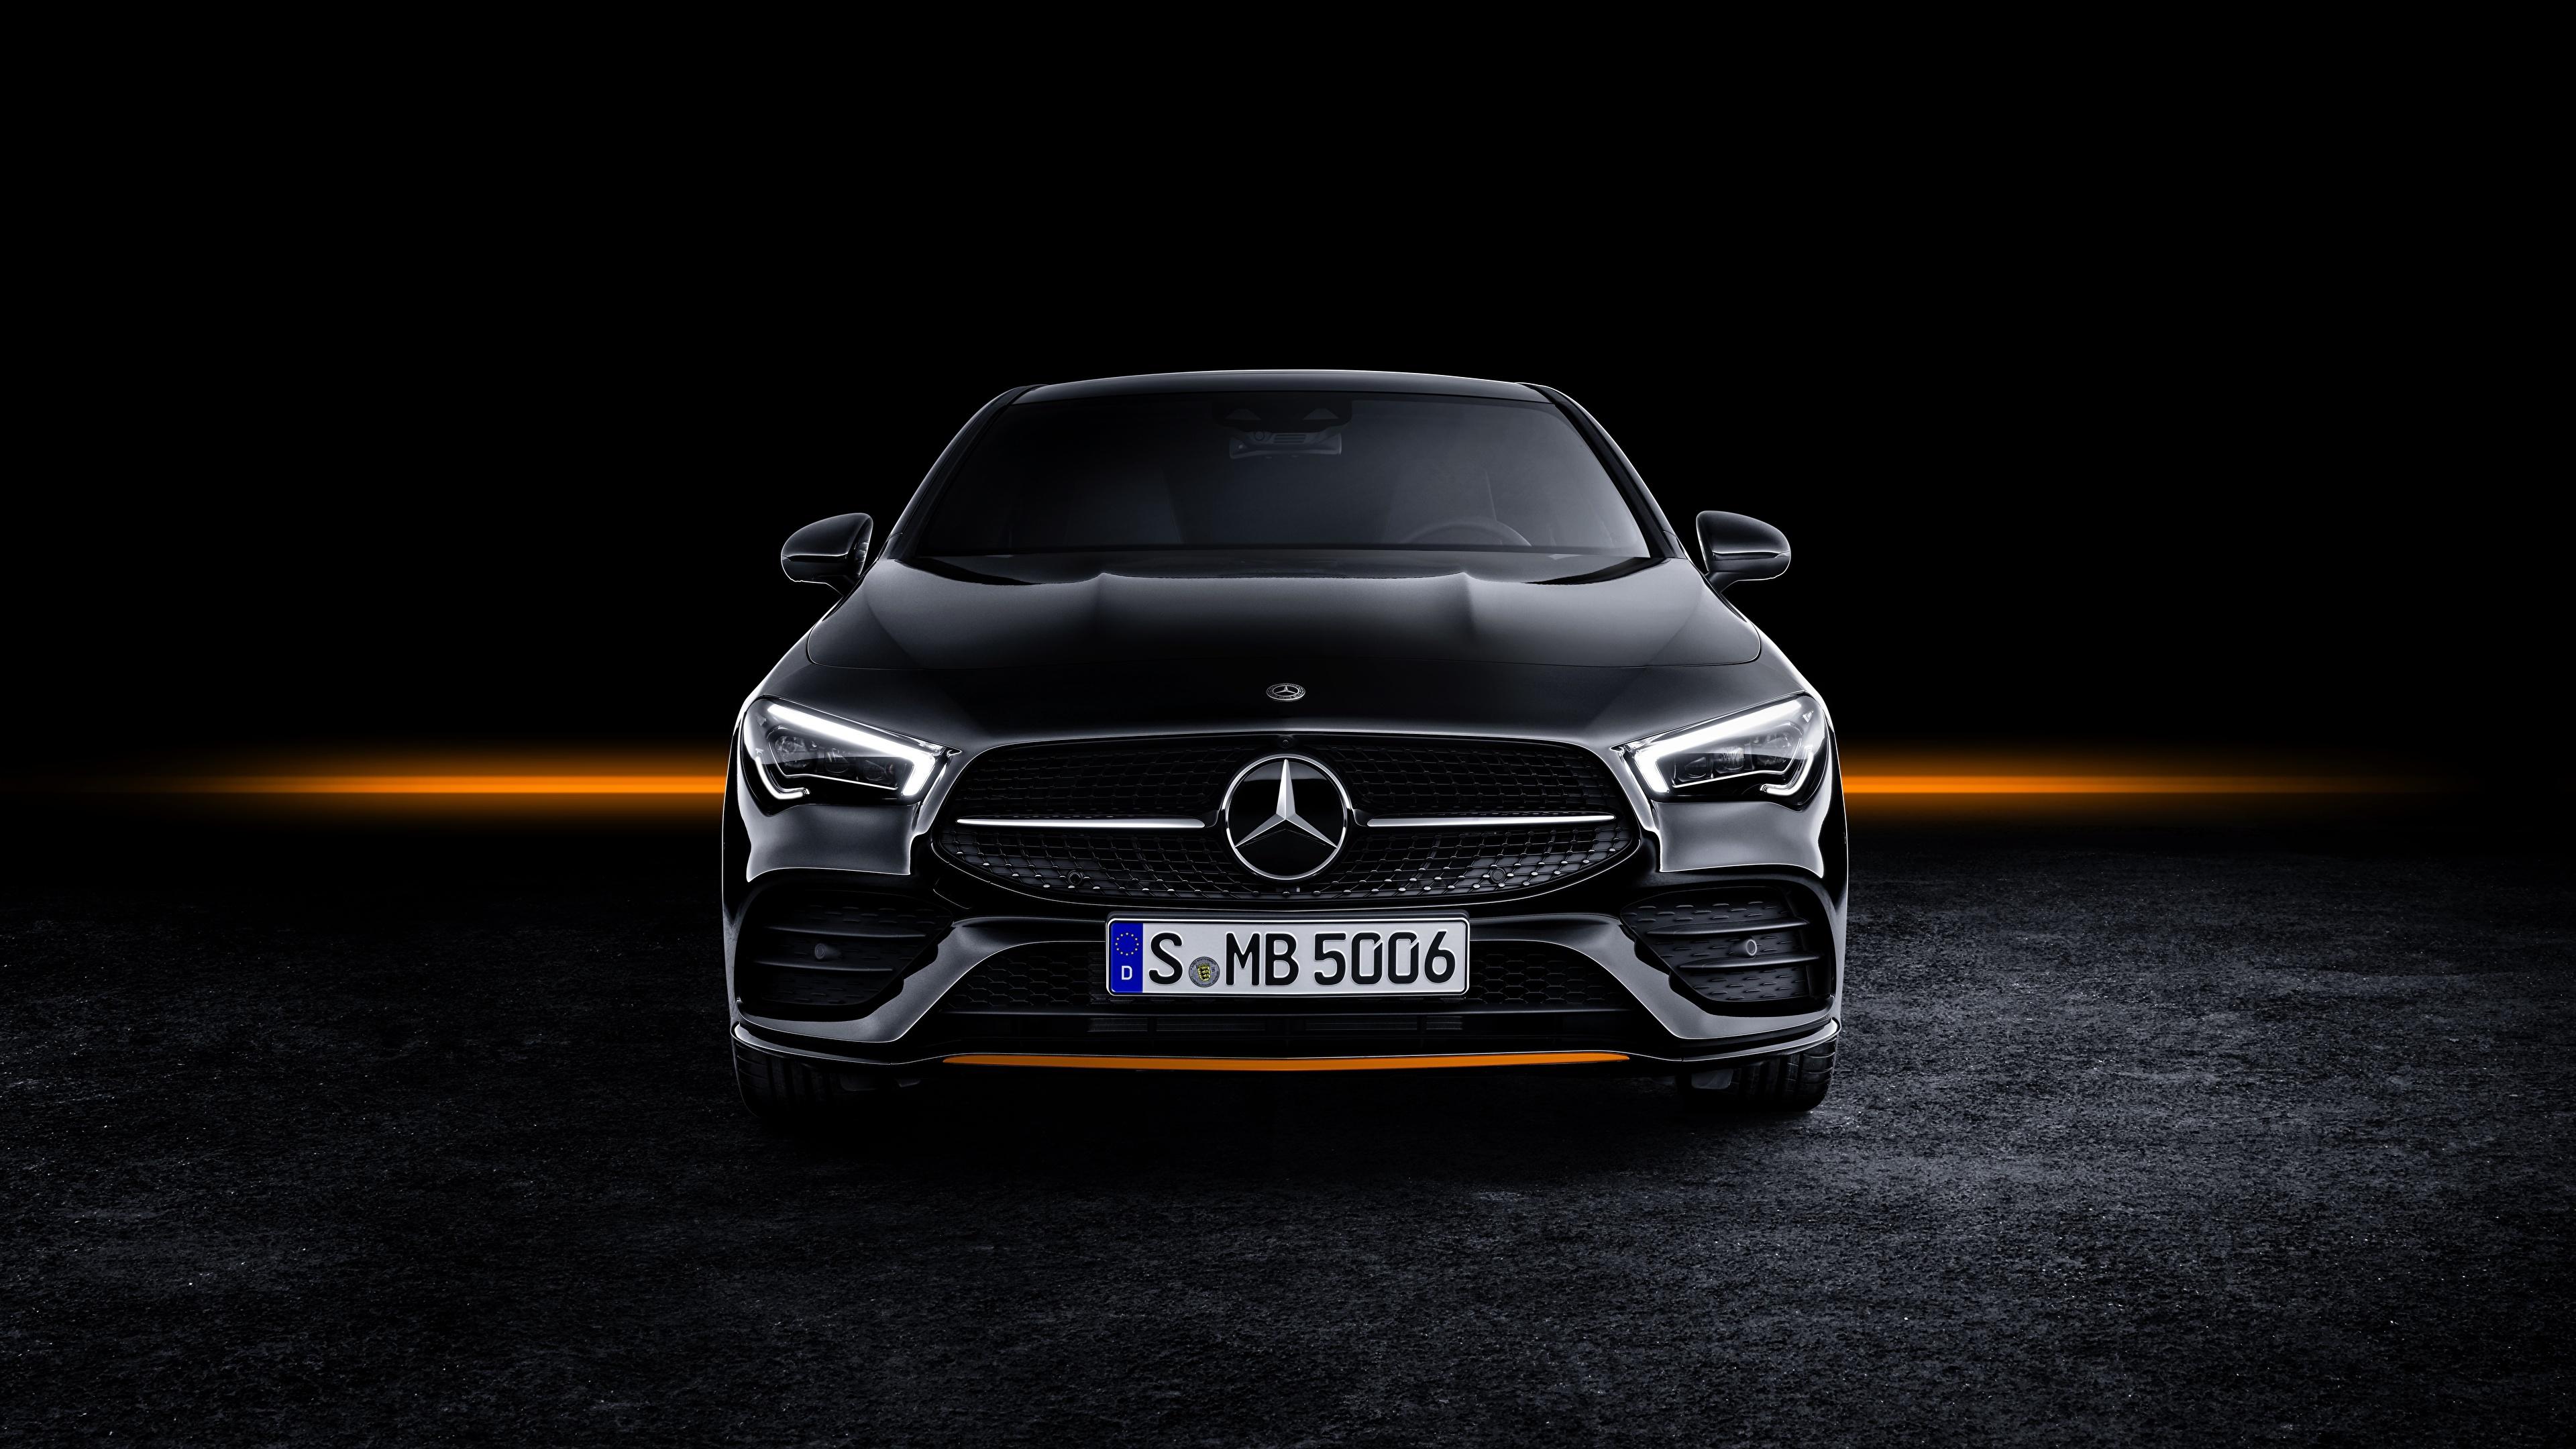 Wallpaper Mercedes Benz CLA AMG Line 2019 Edition Orange 3840x2160 3840x2160